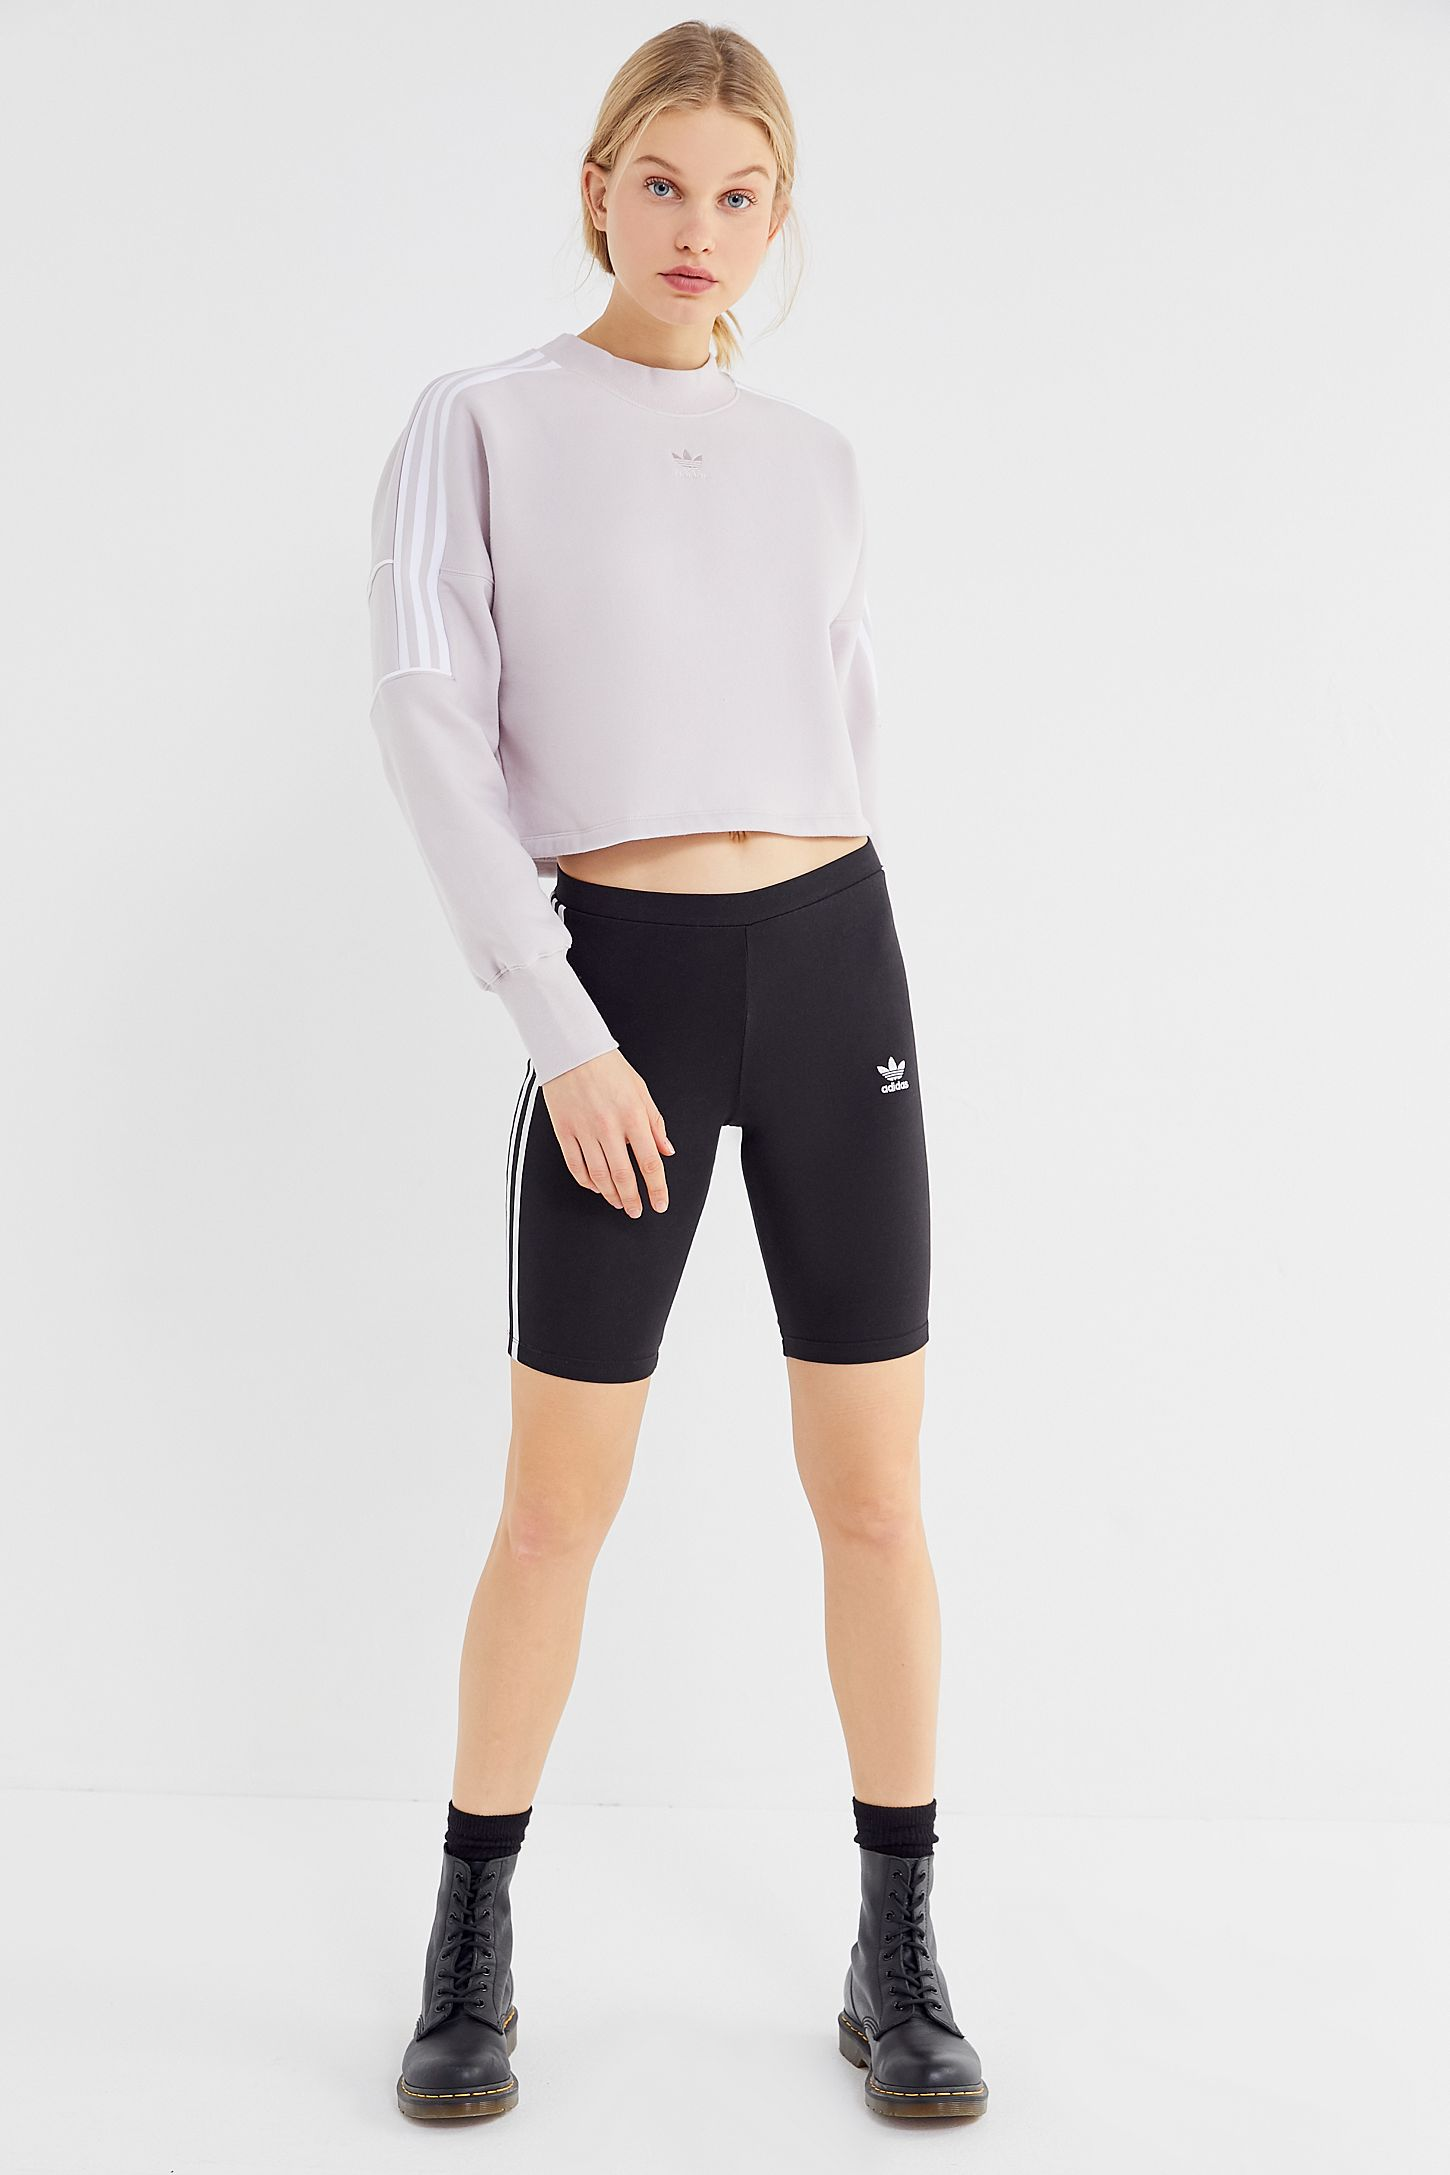 3c28da4efaf adidas Winter Ease Cropped Sweatshirt | Urban Outfitters Canada